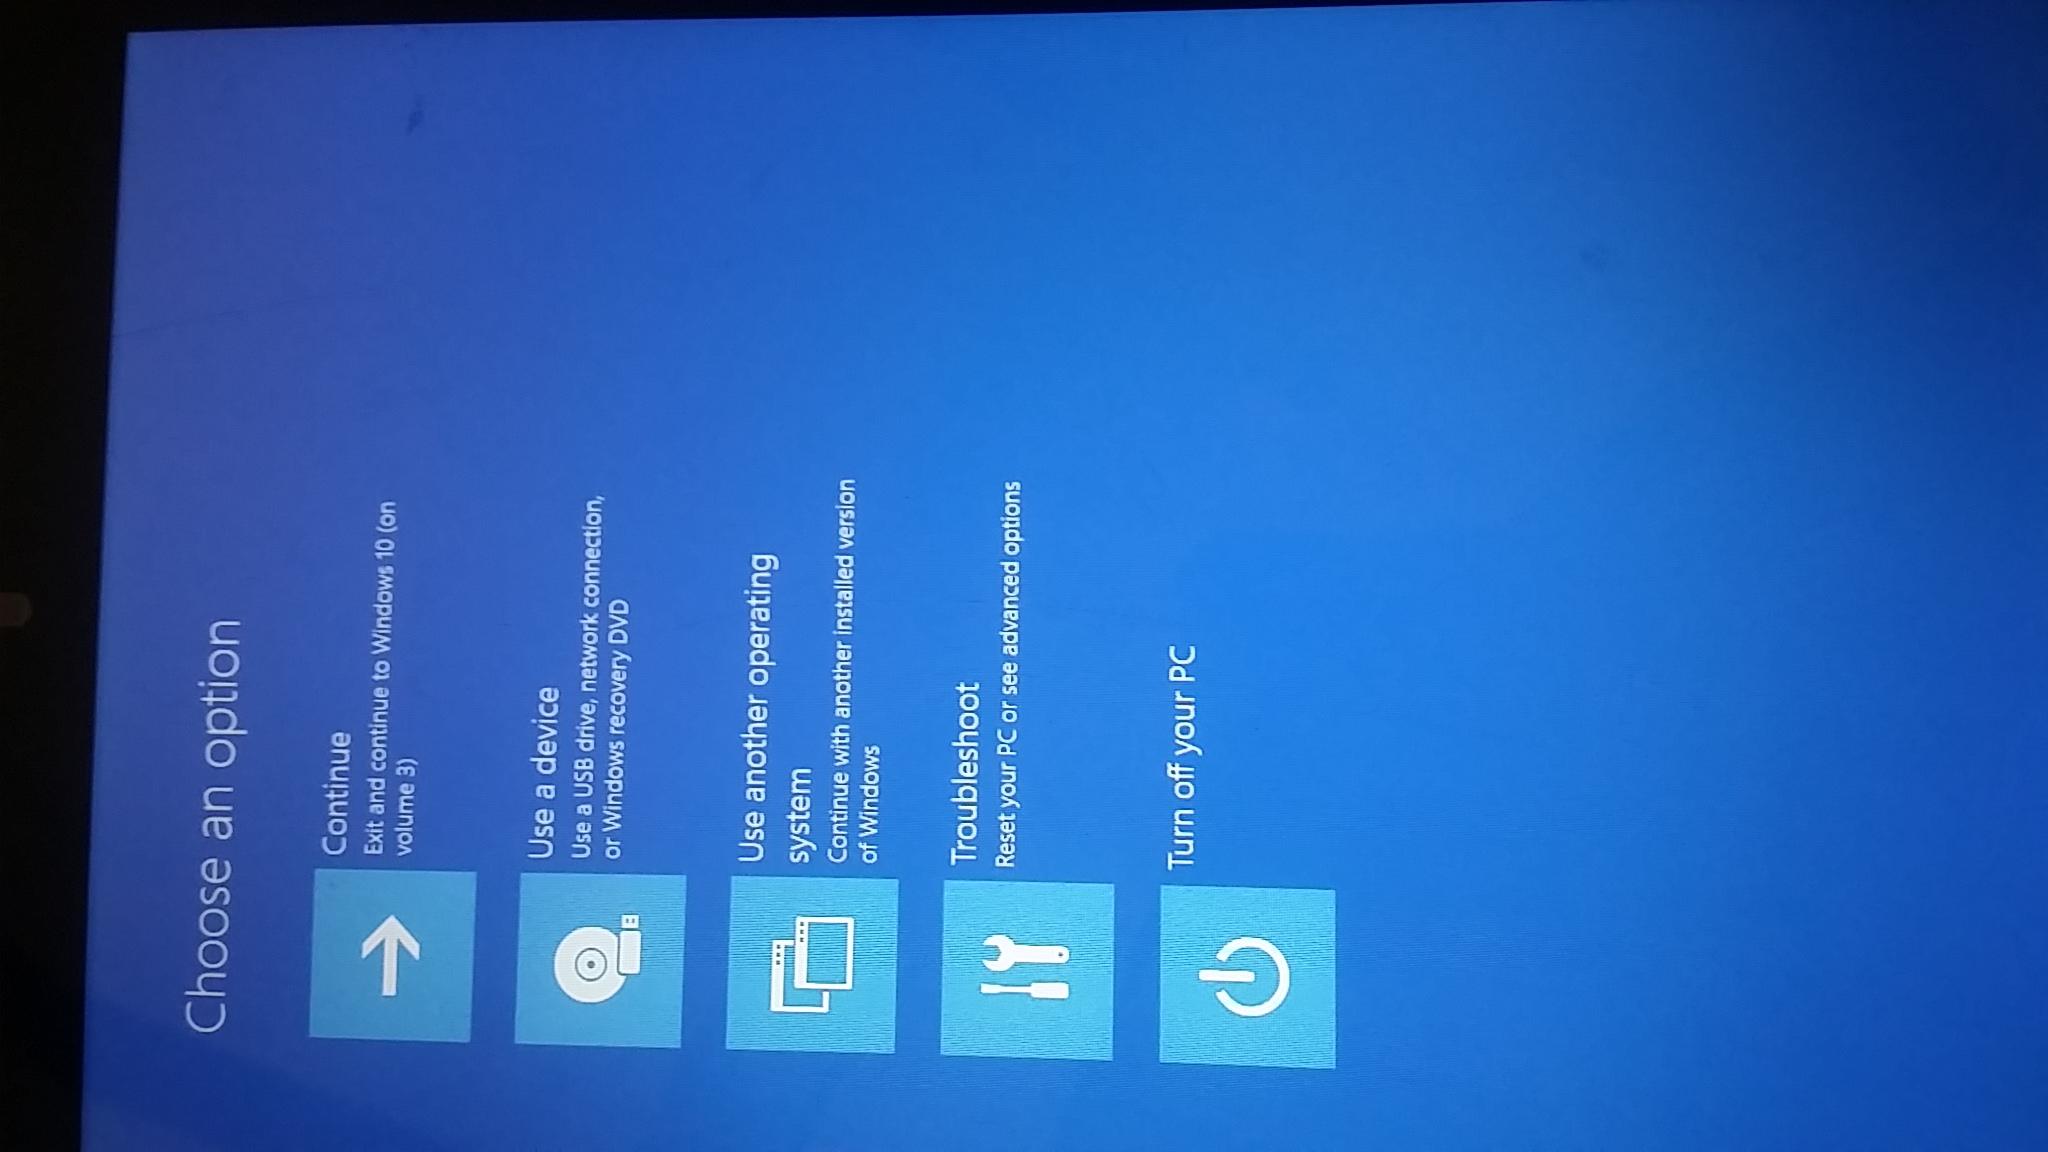 RCA tablet reset - Microsoft Community